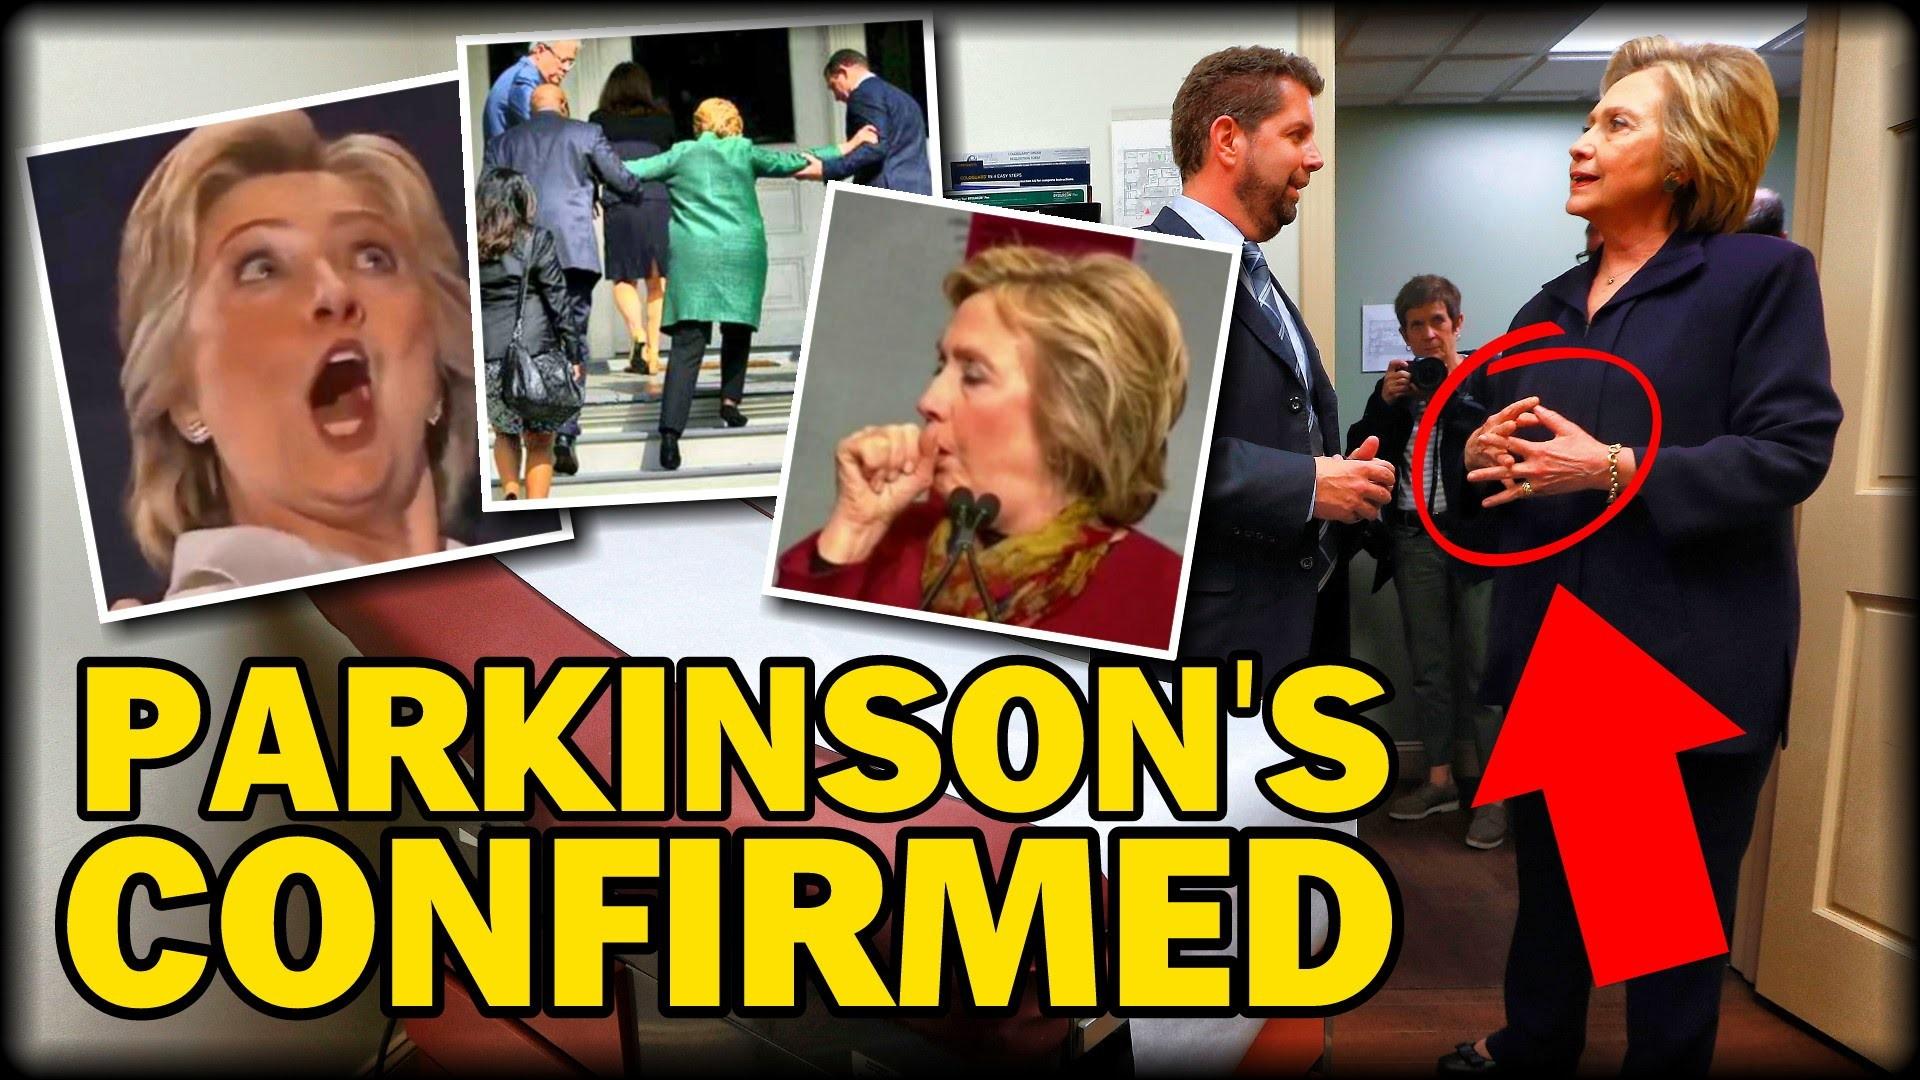 EXCLUSIVE REPORT: HILLARY CLINTON HAS PARKINSON'S DISEASE, DOCTOR CONFIRMS  – YouTube